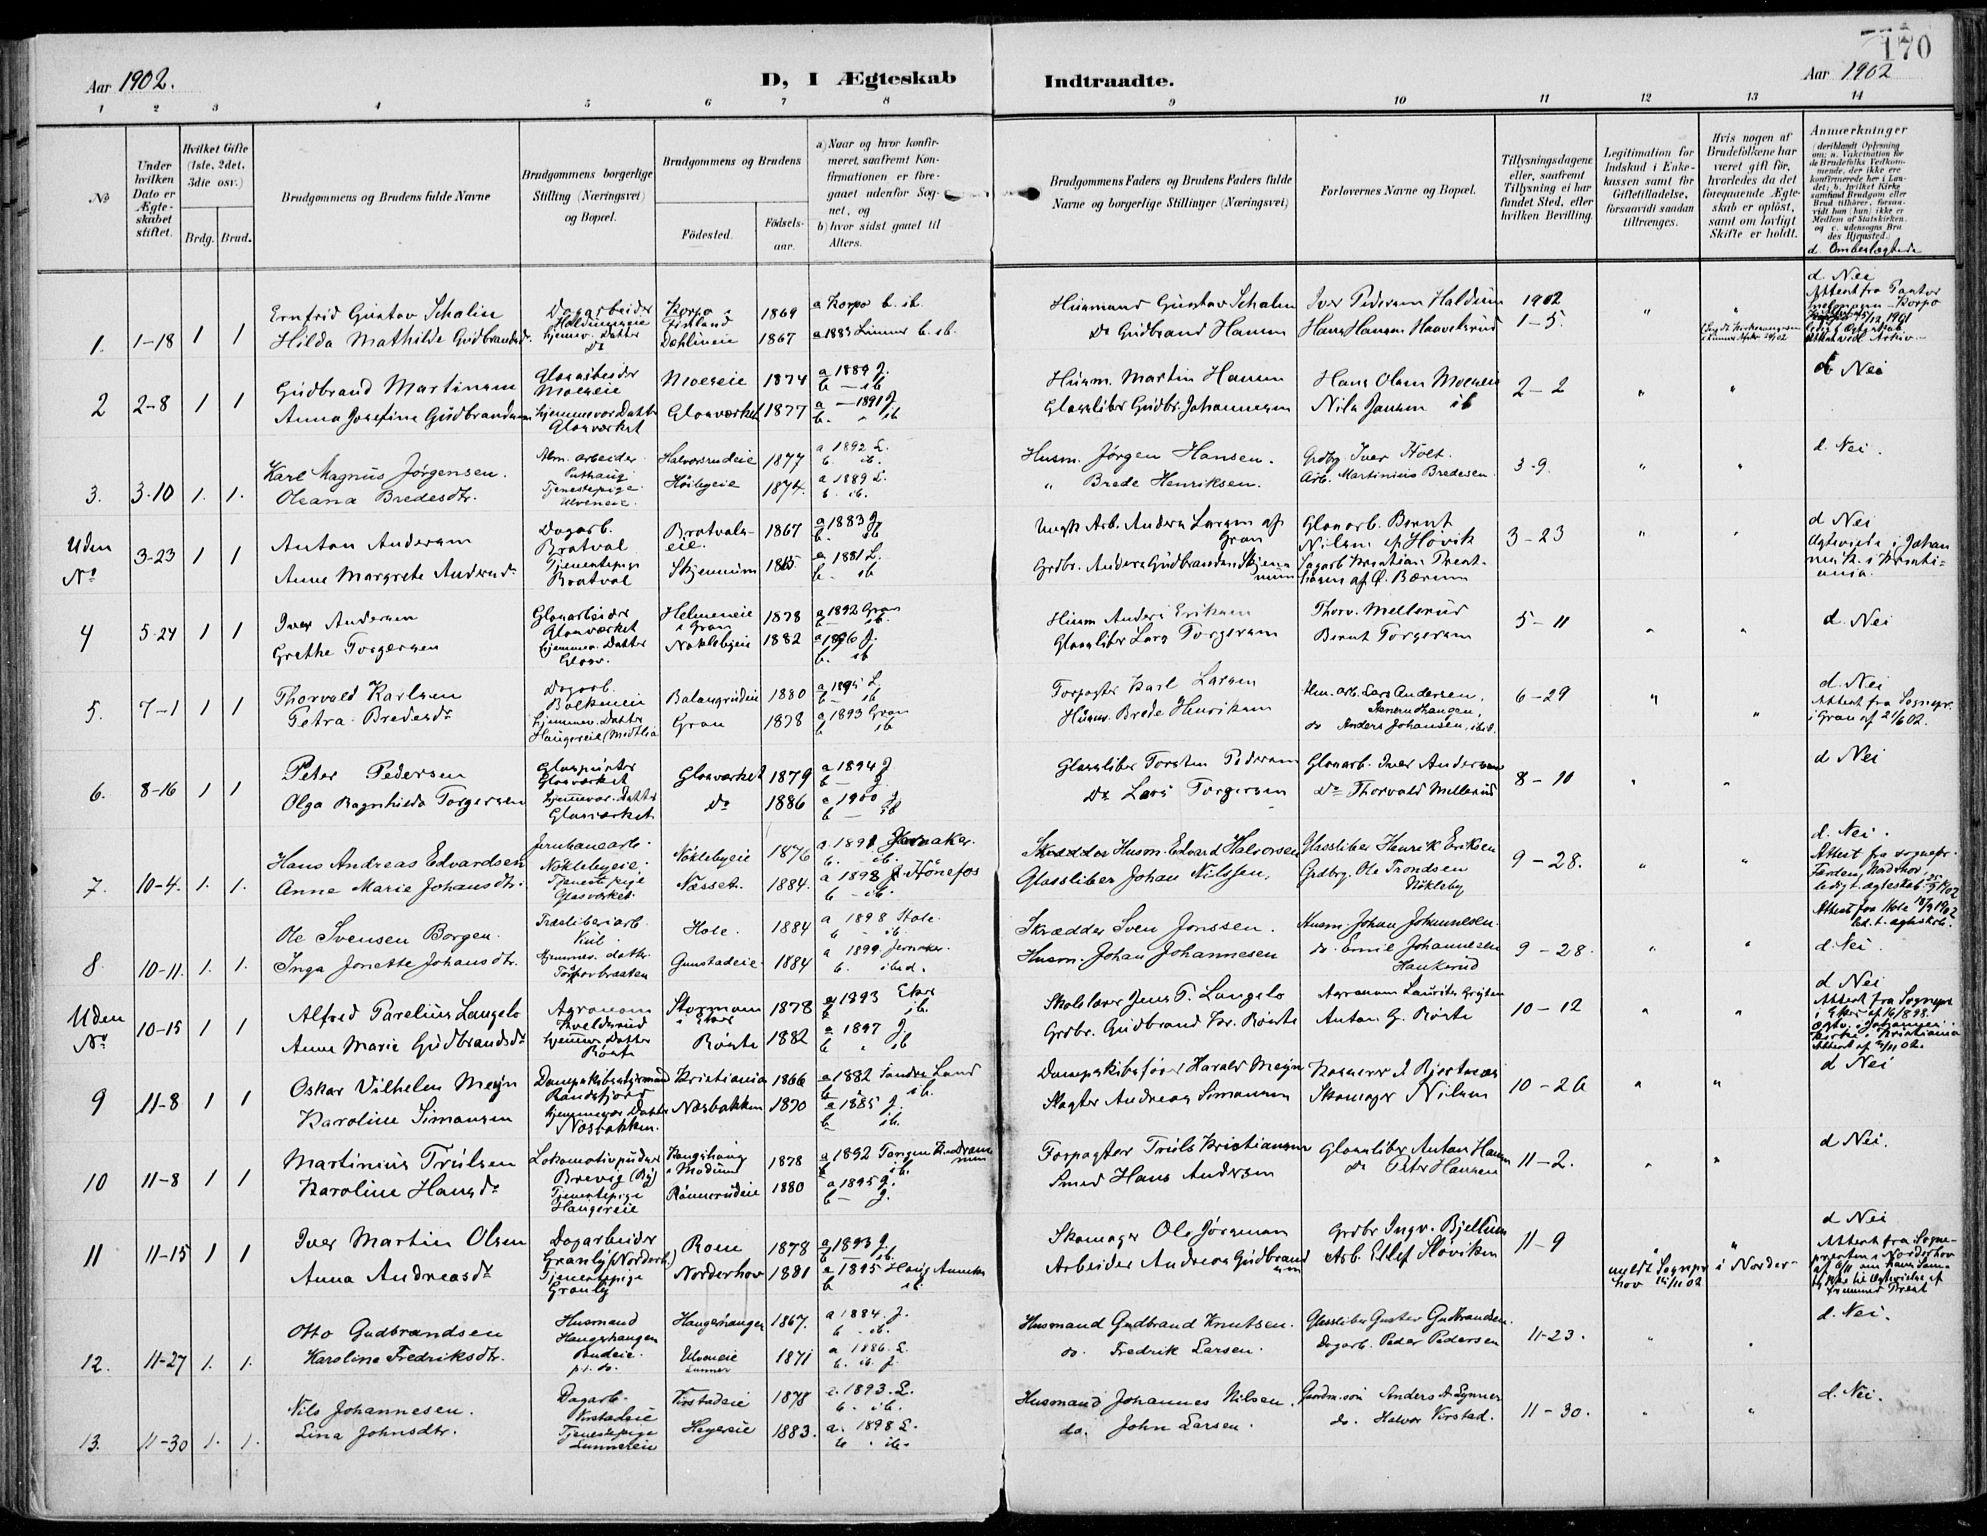 SAH, Jevnaker prestekontor, Ministerialbok nr. 11, 1902-1913, s. 170